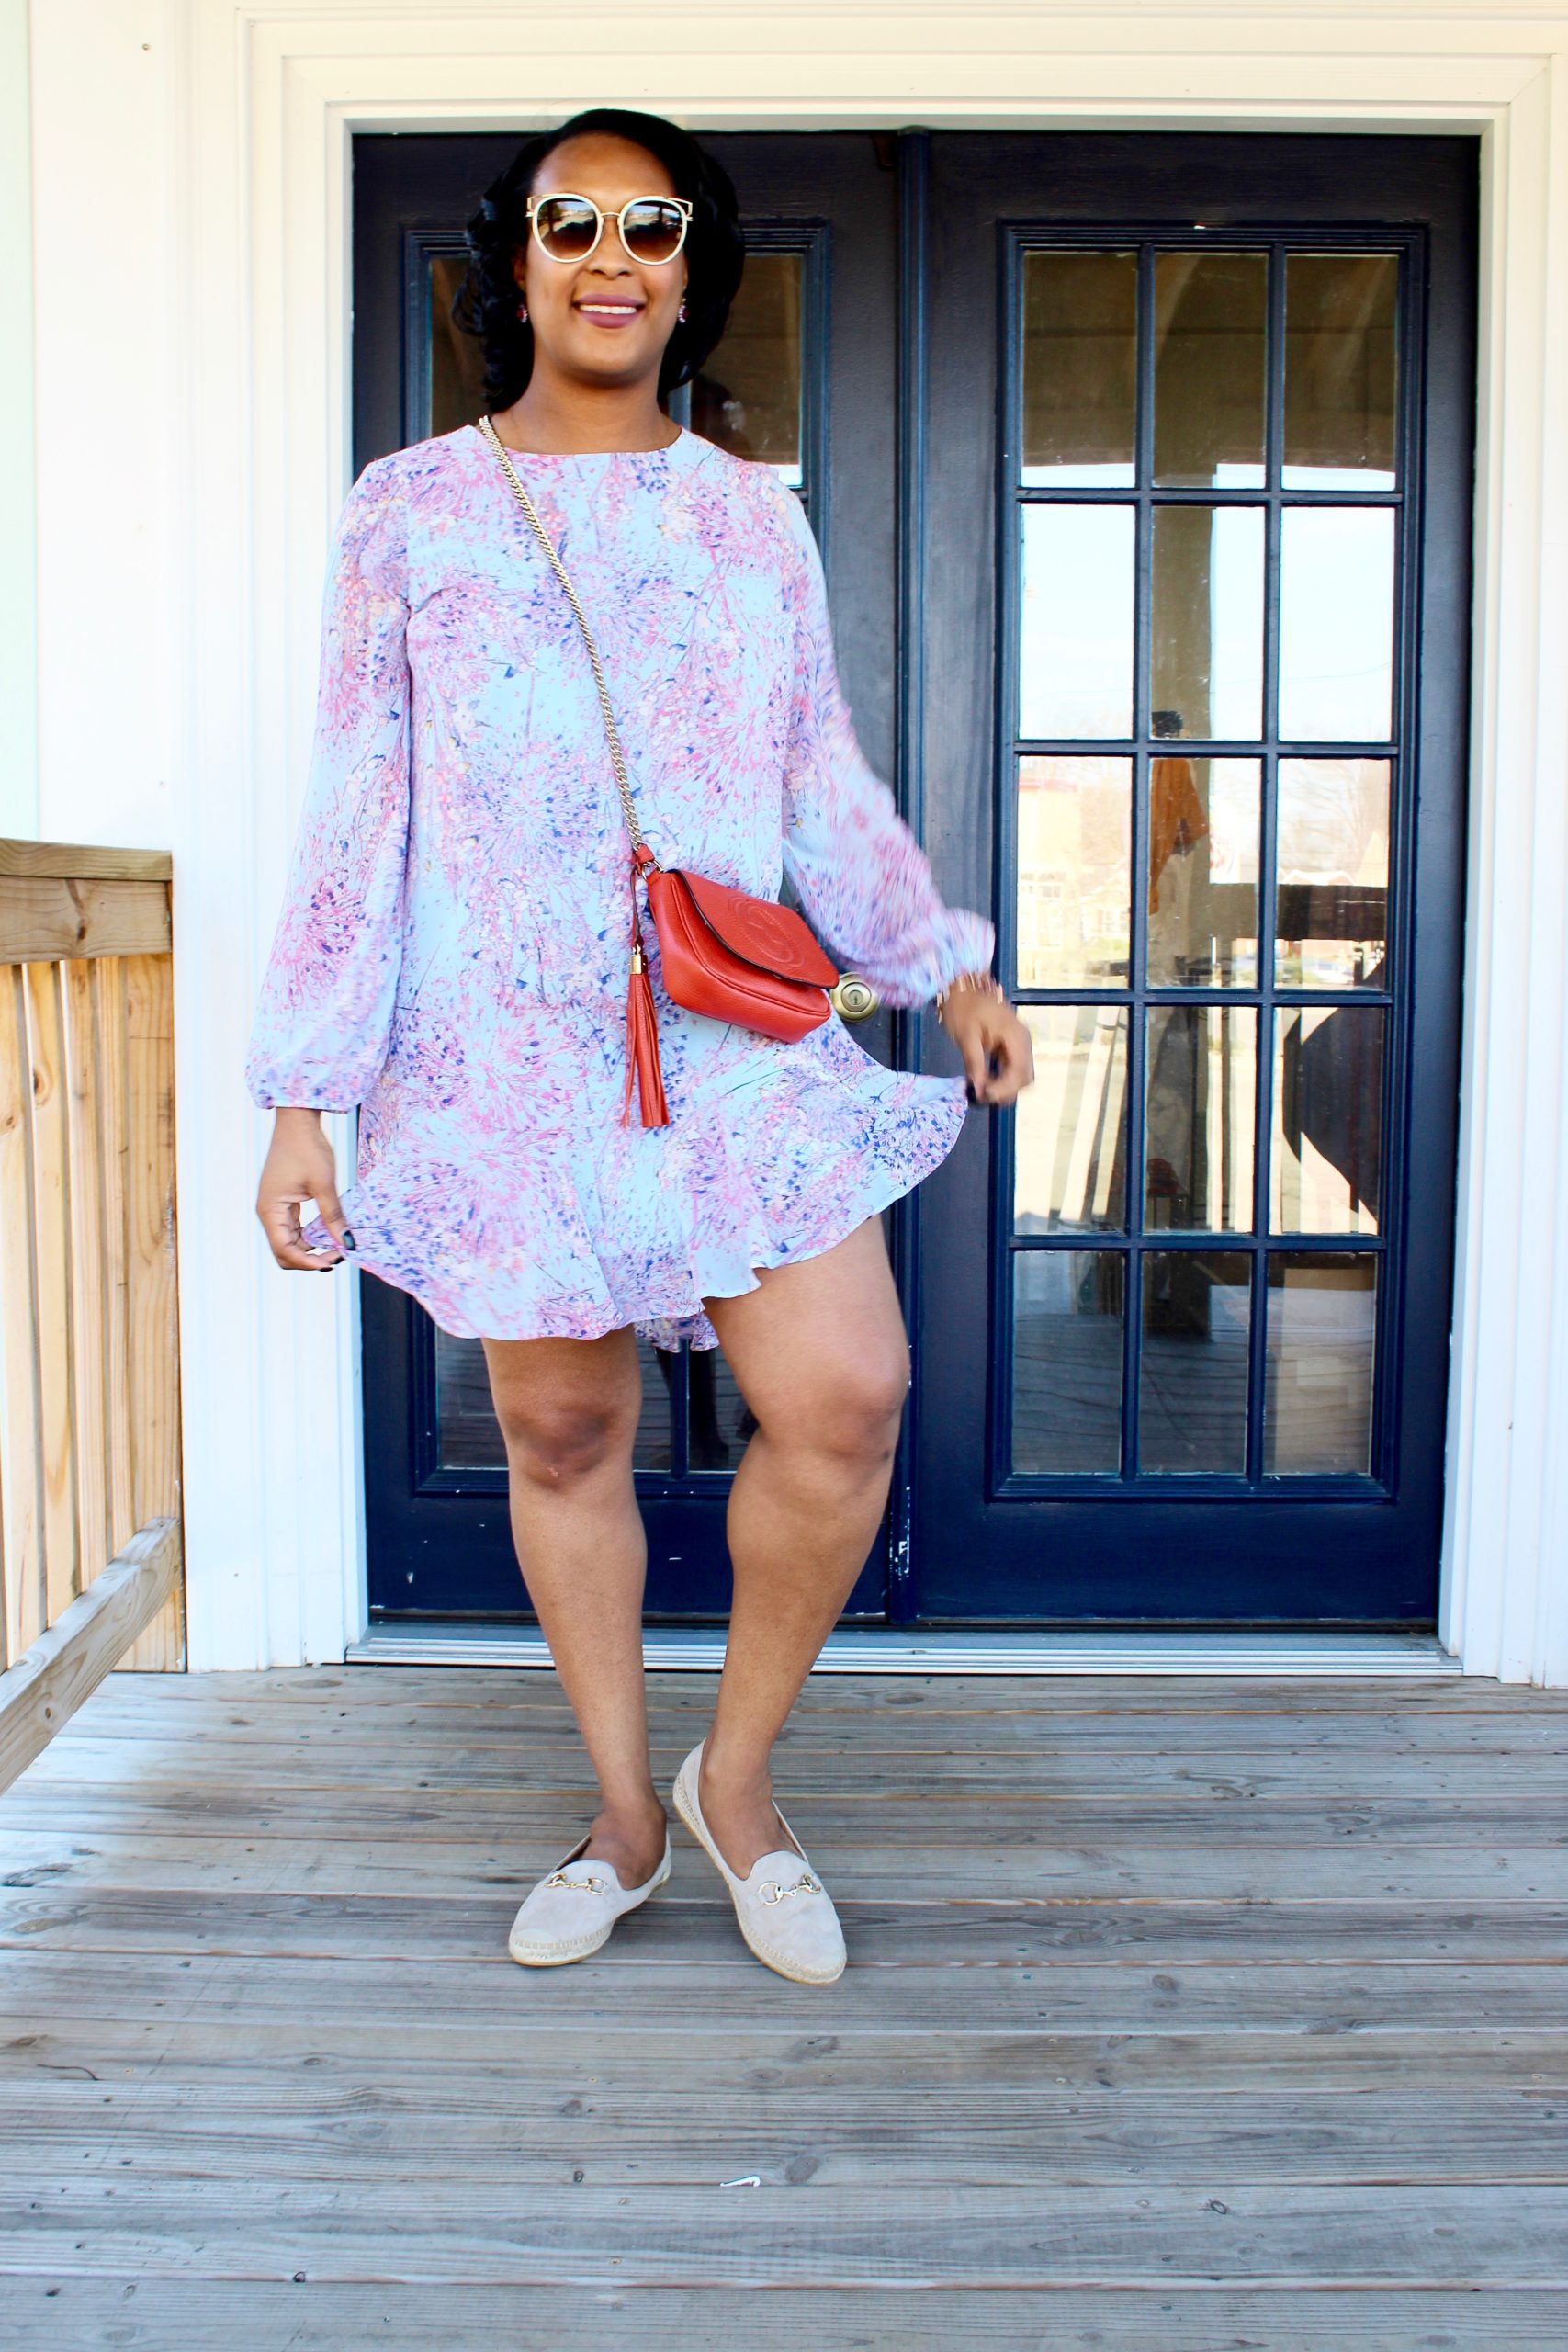 Spring Clothing, Belle Monde Boutique